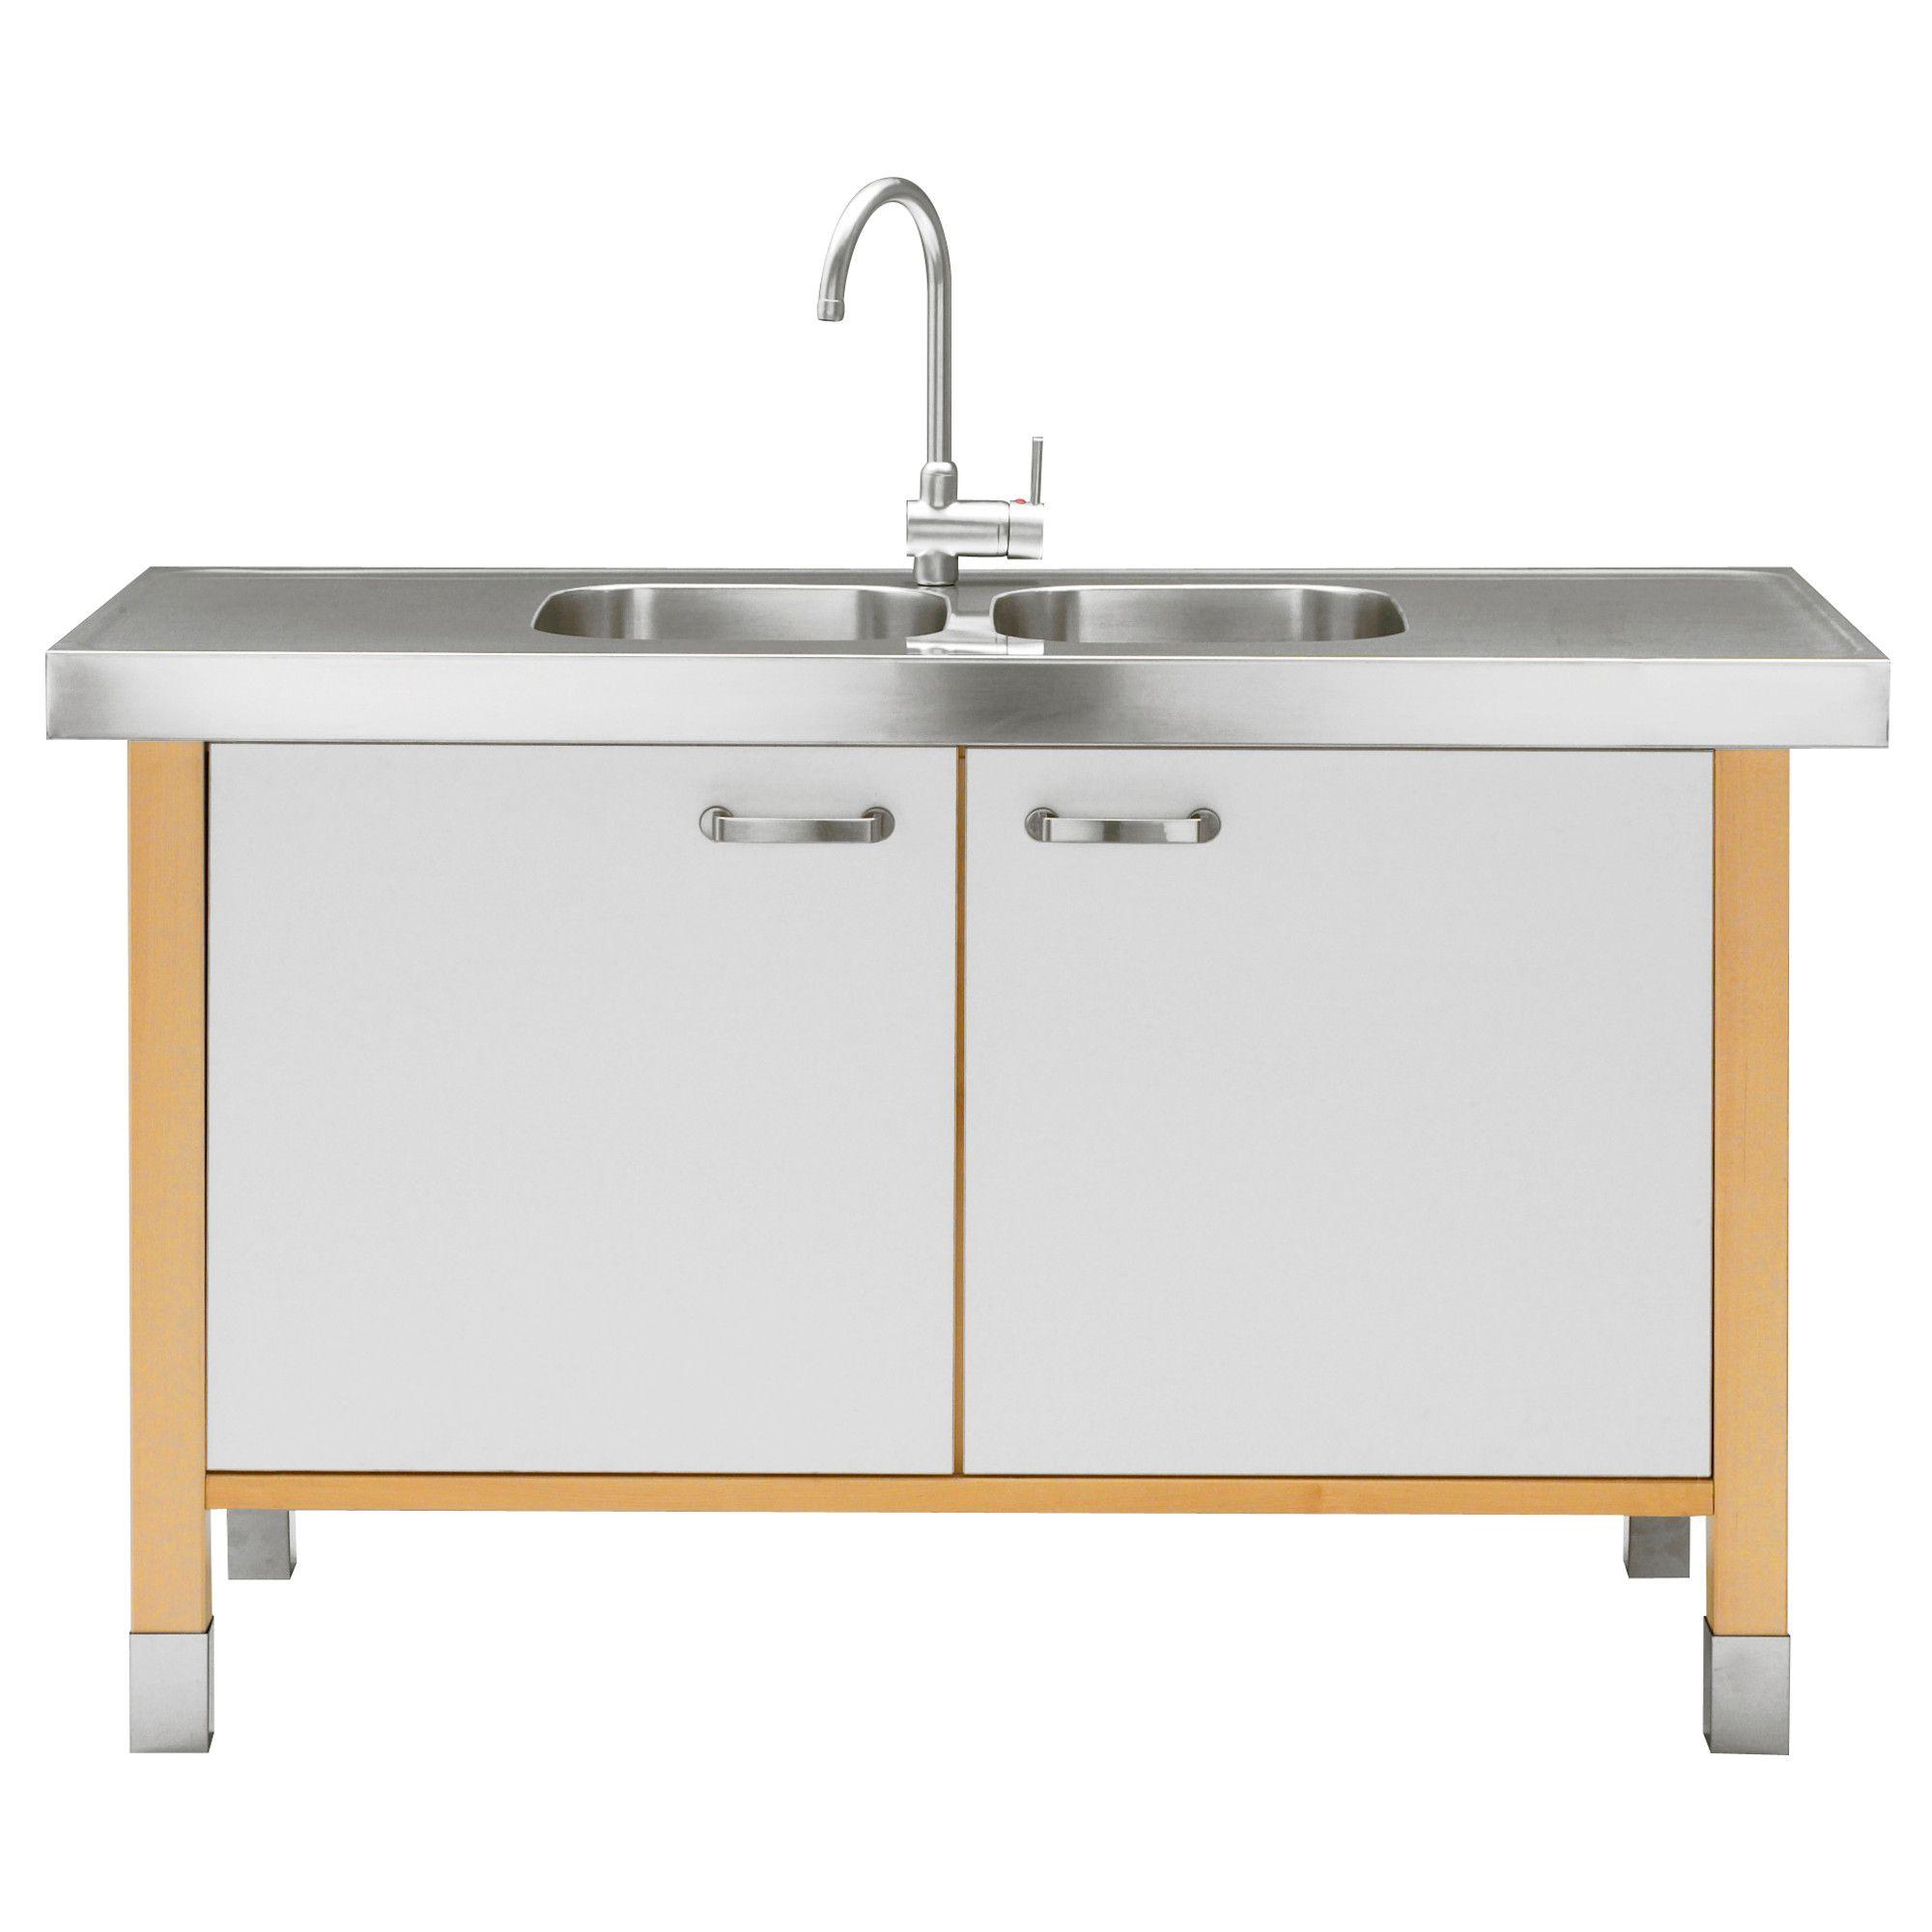 Furniture And Home Furnishings Ikea Kitchen Sink Ikea Sinks